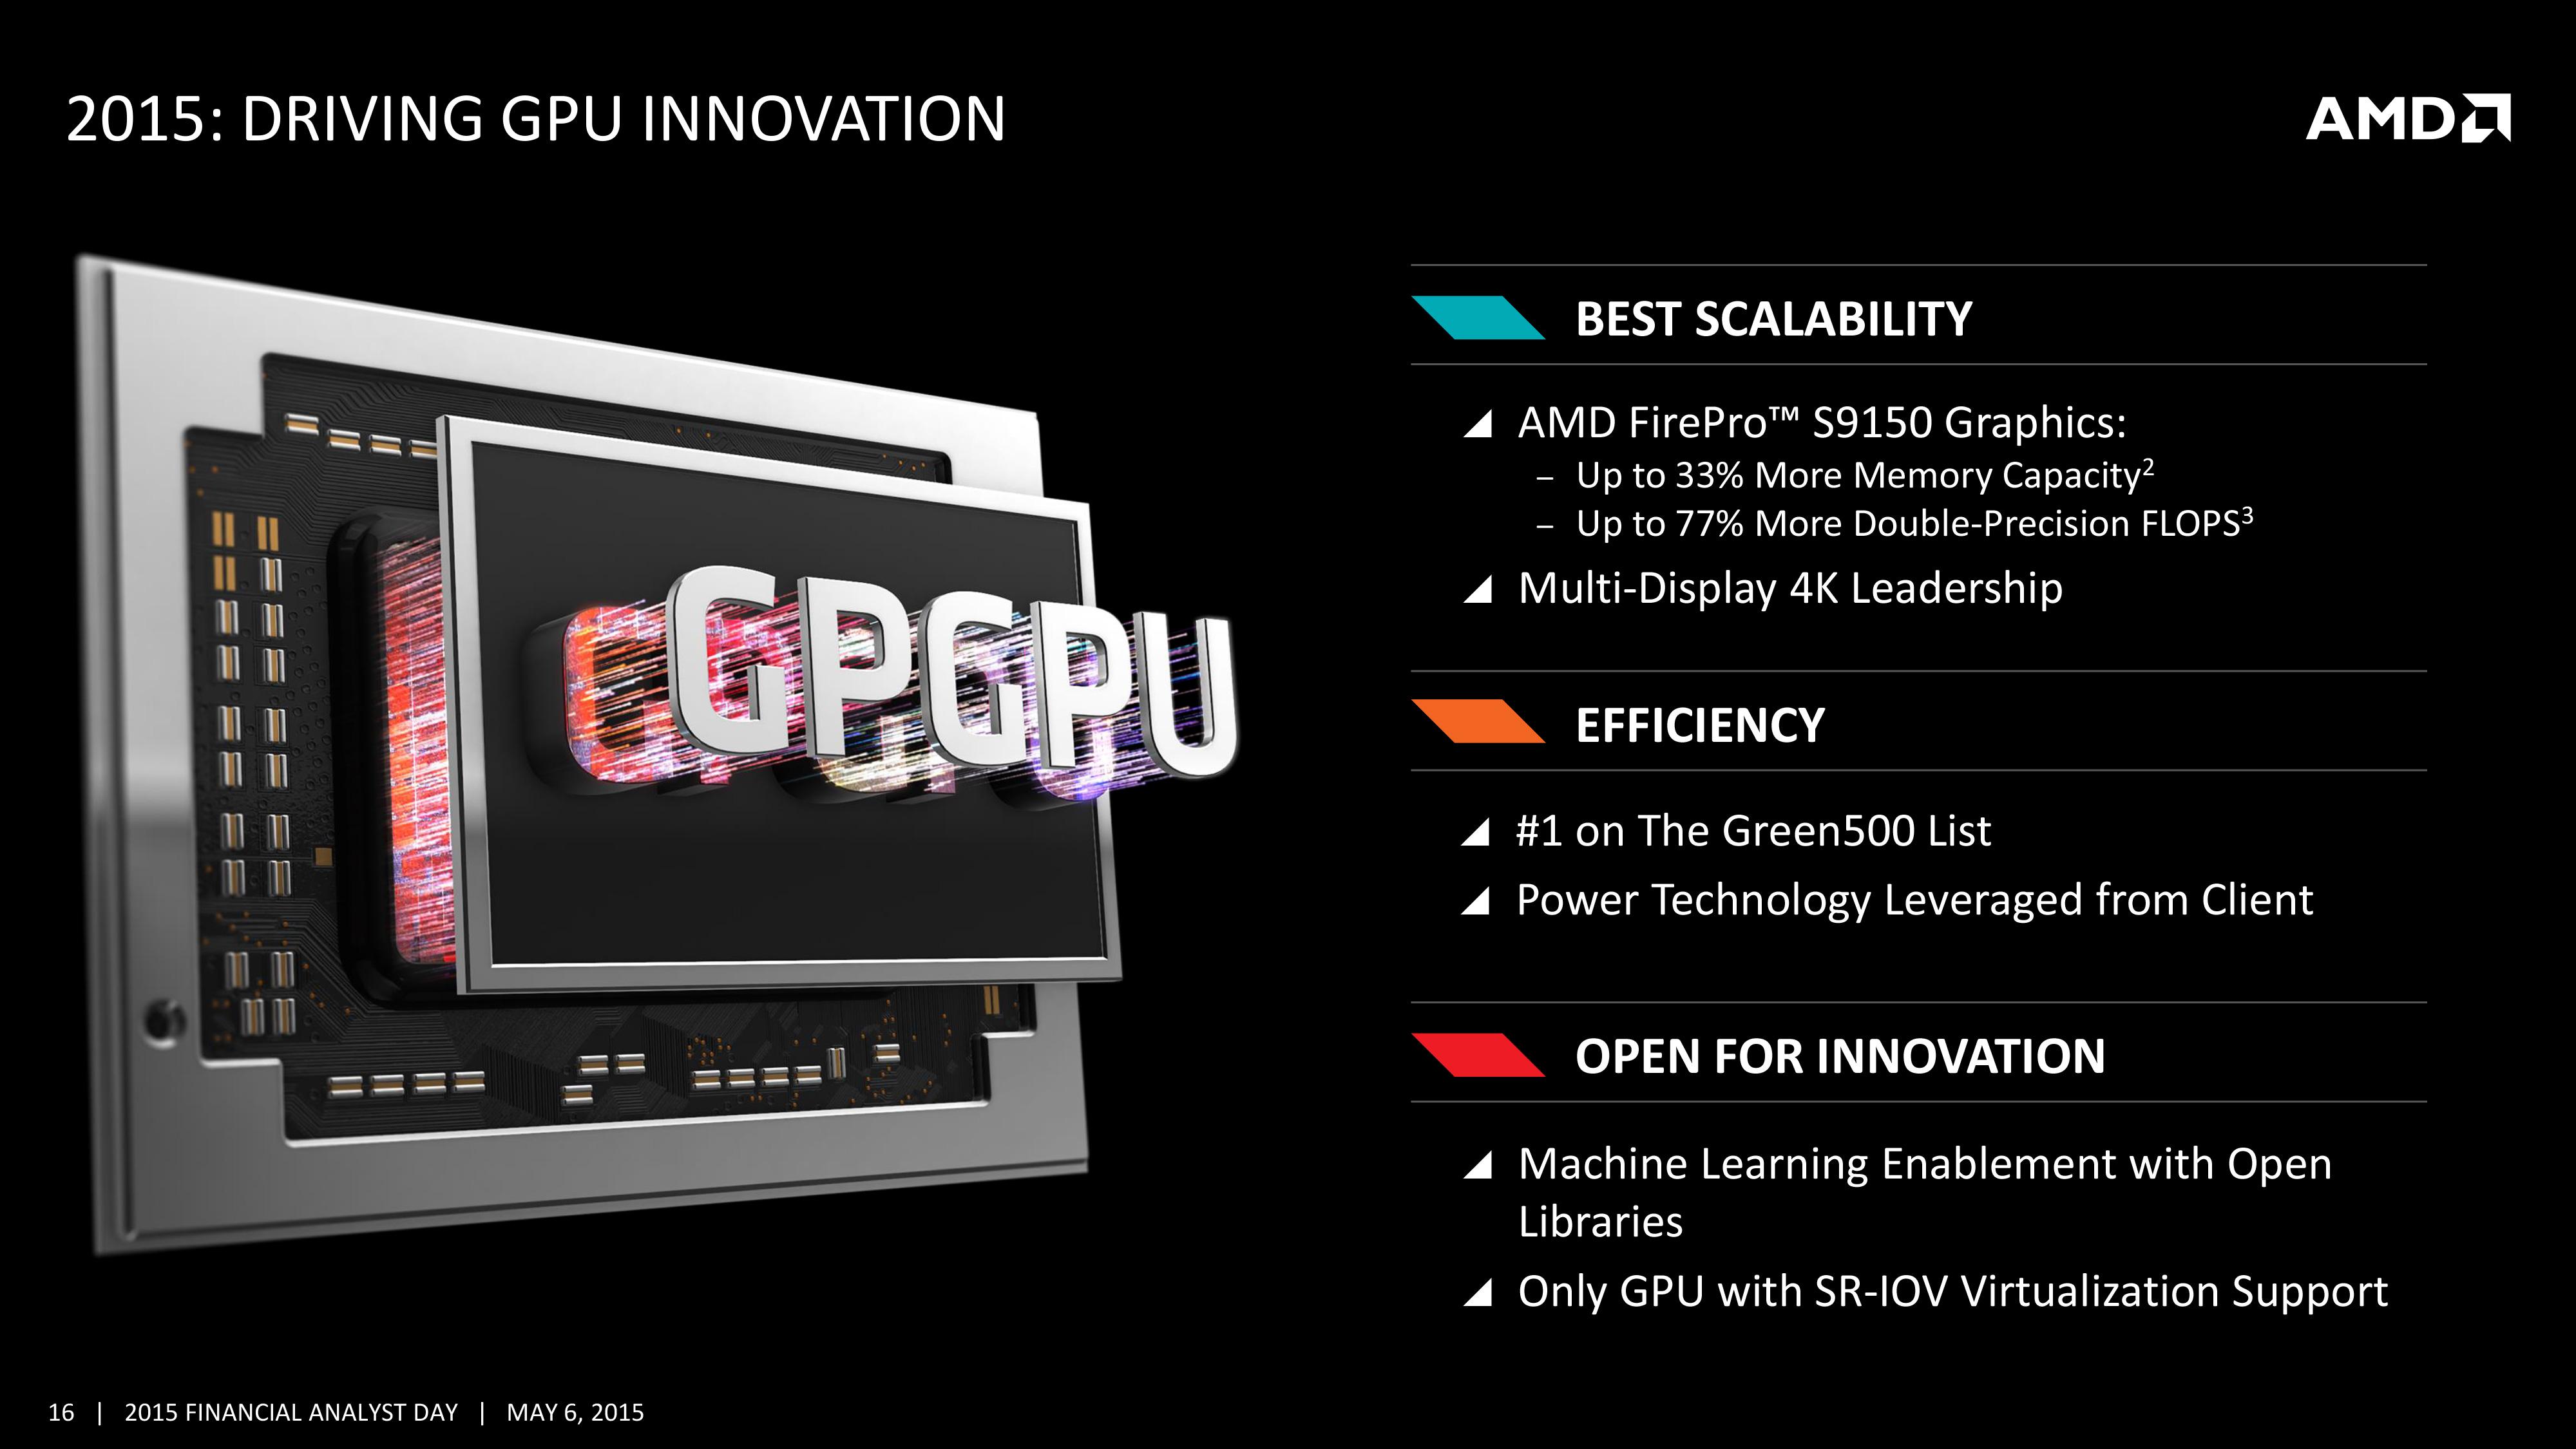 AMD's 2016-2017 Datacenter Roadmap: x86, ARM, and GPGPU